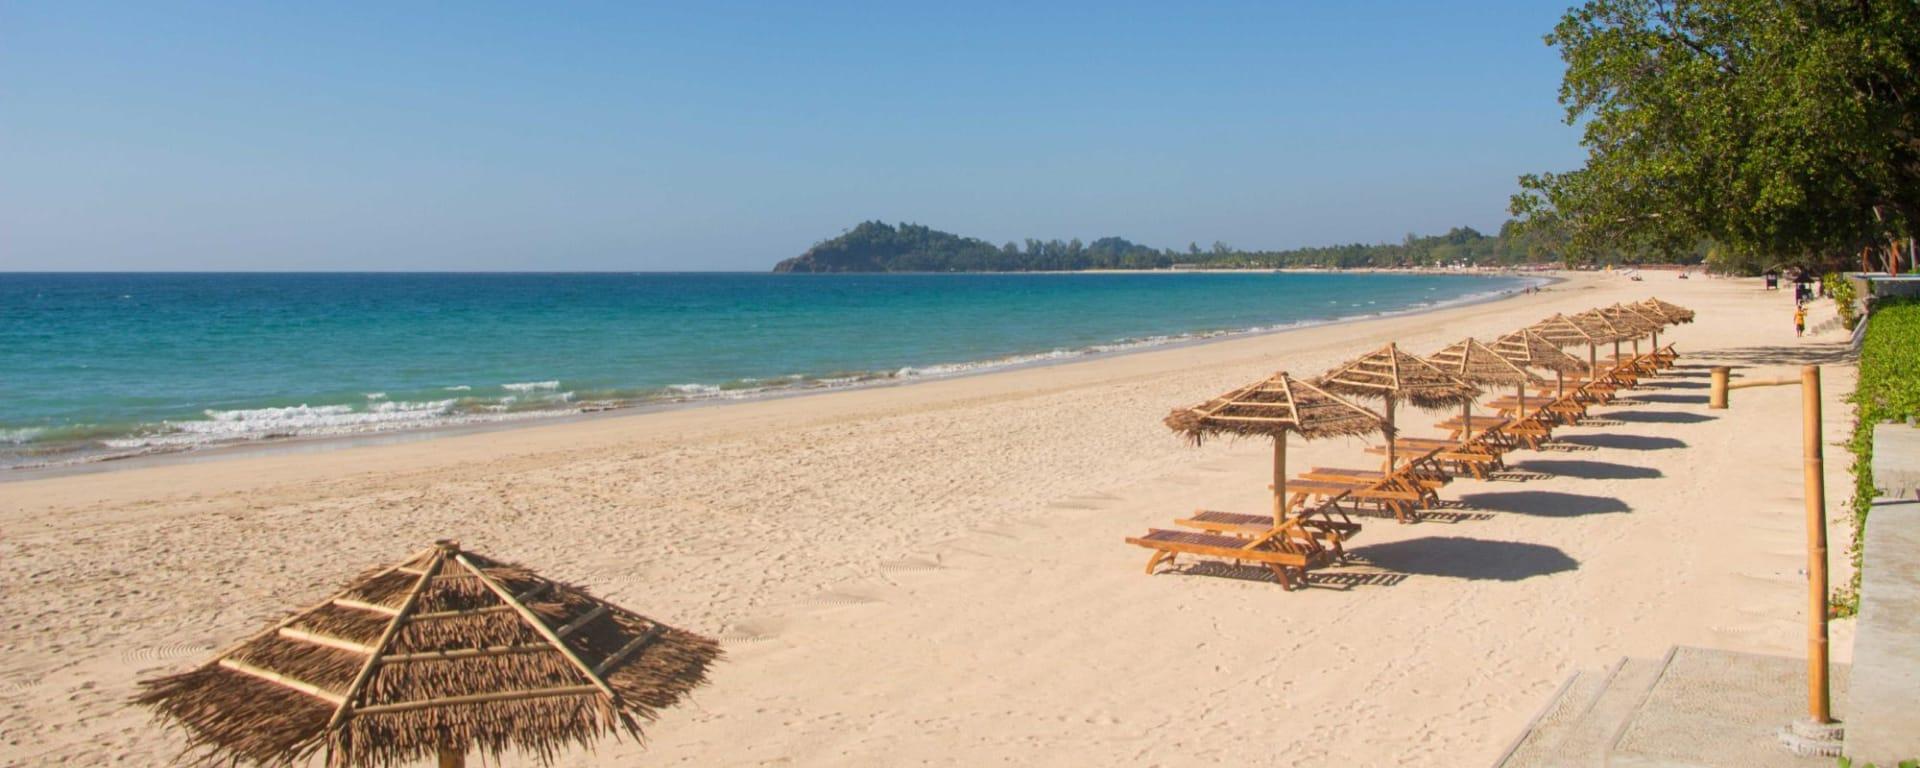 Pristine Mermaid Resort in Ngapali: Beach